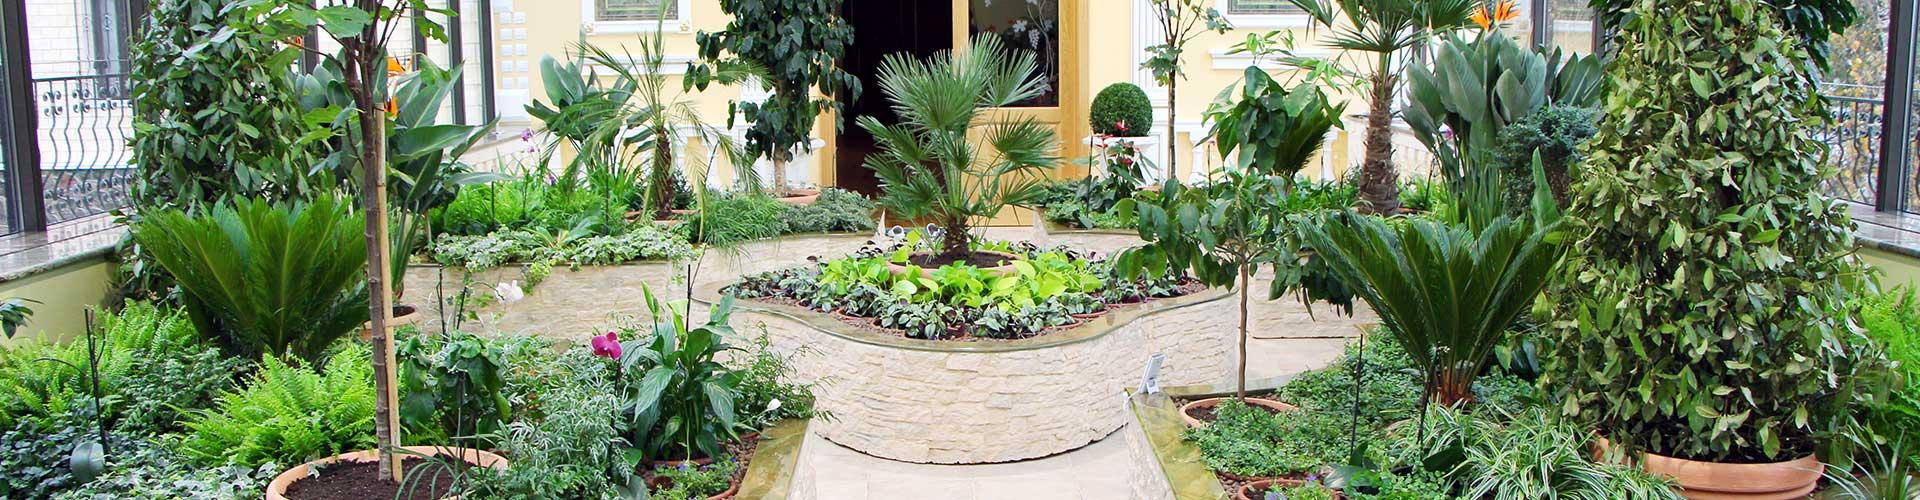 зимний сад (проектирование и реализация)